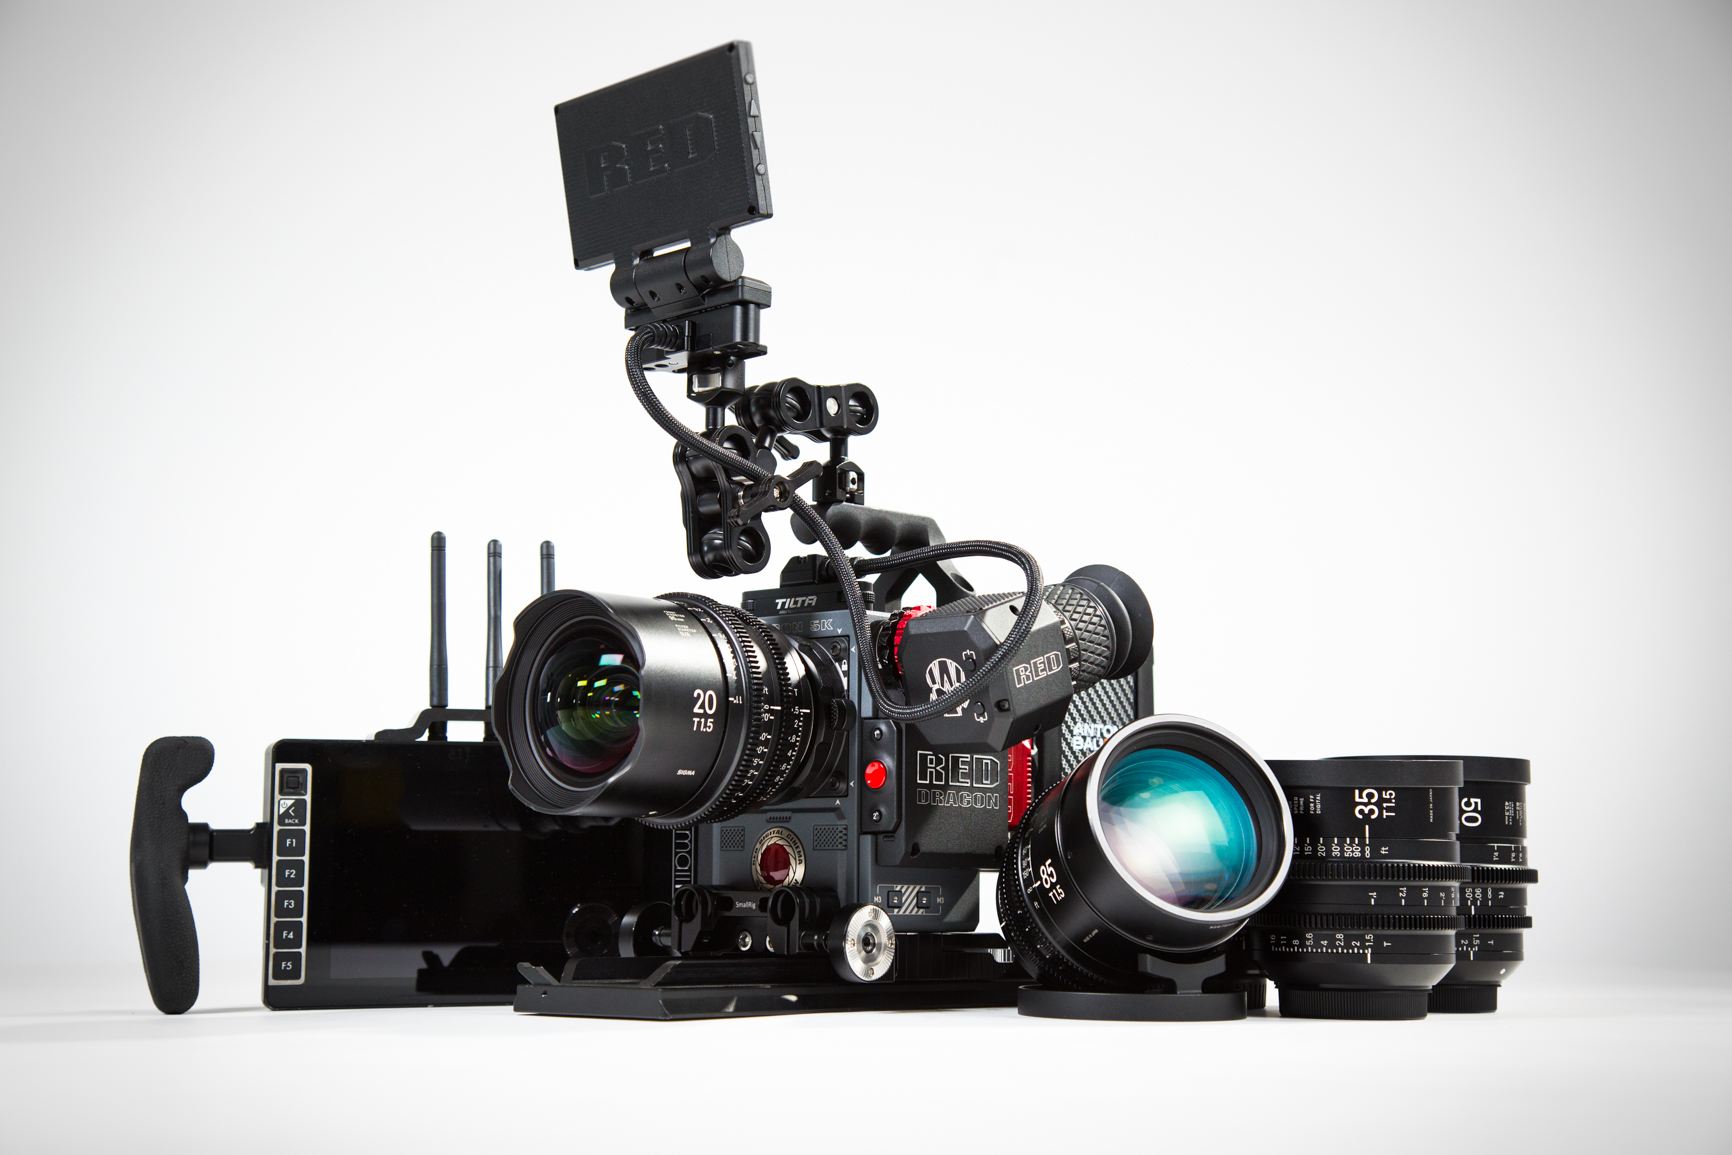 RED Scarlet W, Sigma Cine Prime, SmallHD 703 Bolt